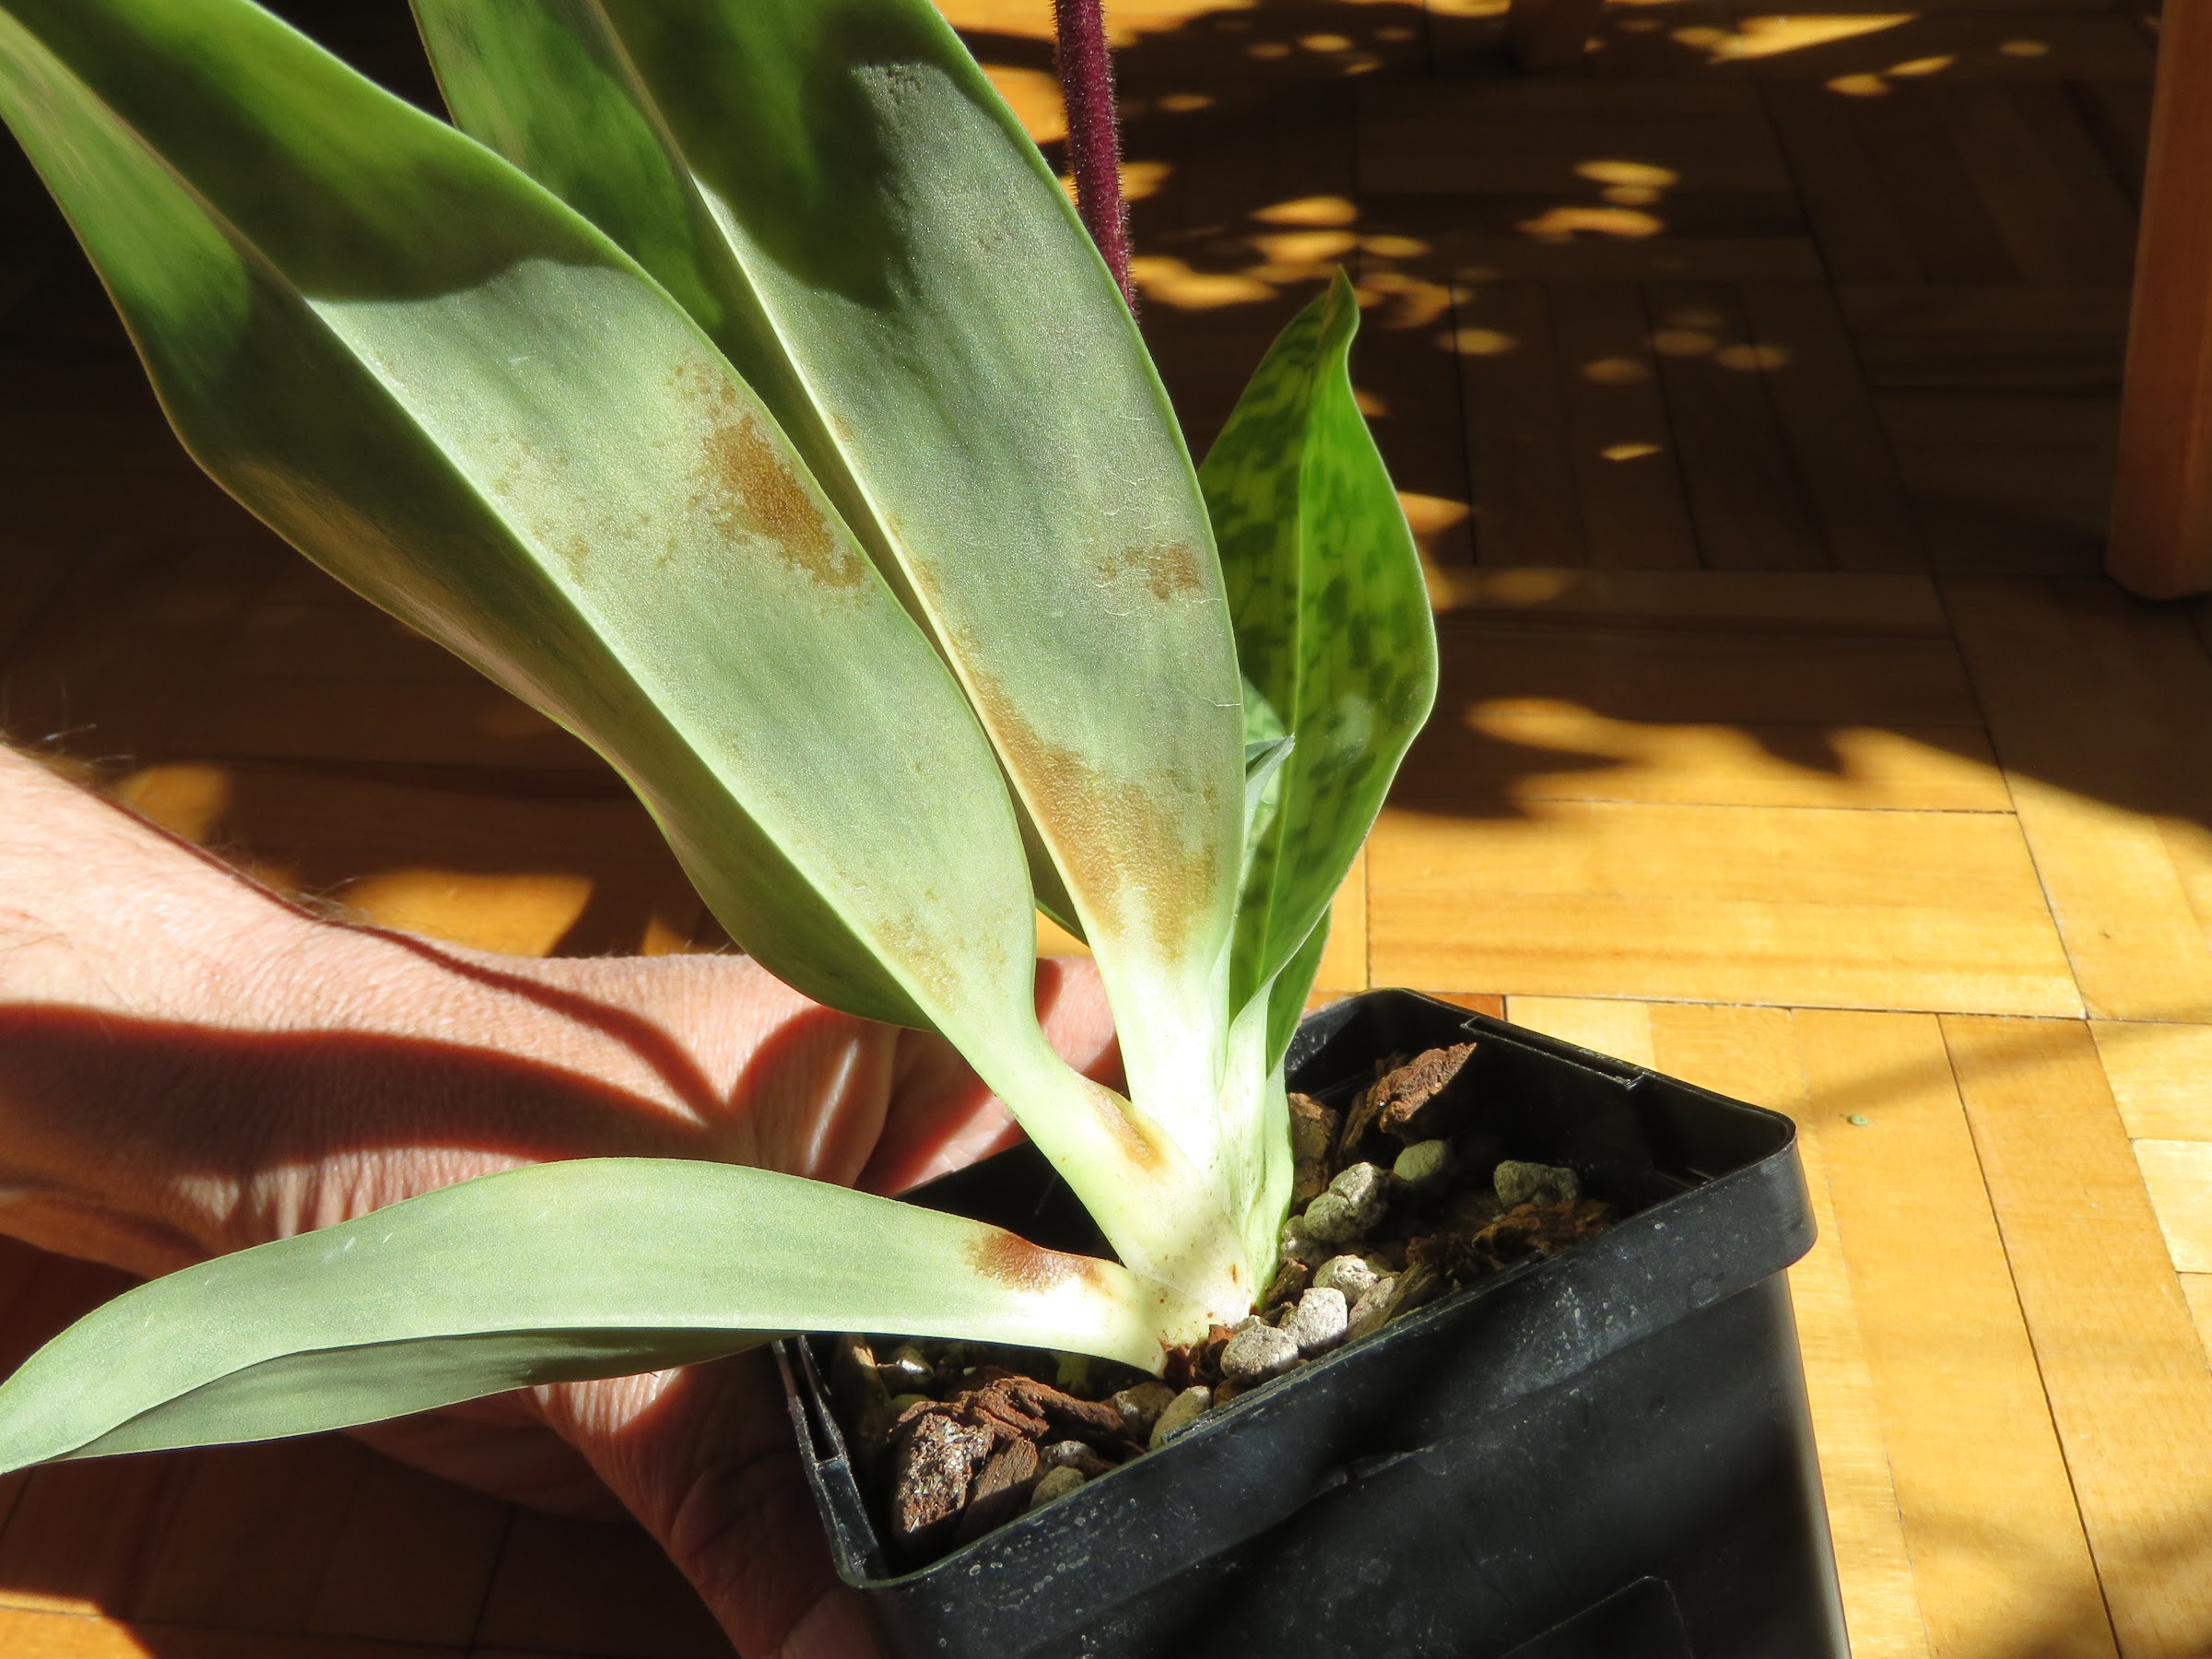 Les orchidées de Grigri - Page 4 MKNoiPEqIo-Py6fvElBOgBmyr6RJDRLz8ZI1ym9s7eGX462swuc6gAMddYMP40P-xhioepgJwmdxKtpympG8fLYasp1YLBZDR6LKnMmNNbuVQqZg5usim9RXsZhNDO0b8oh6az6DISQ=w2400